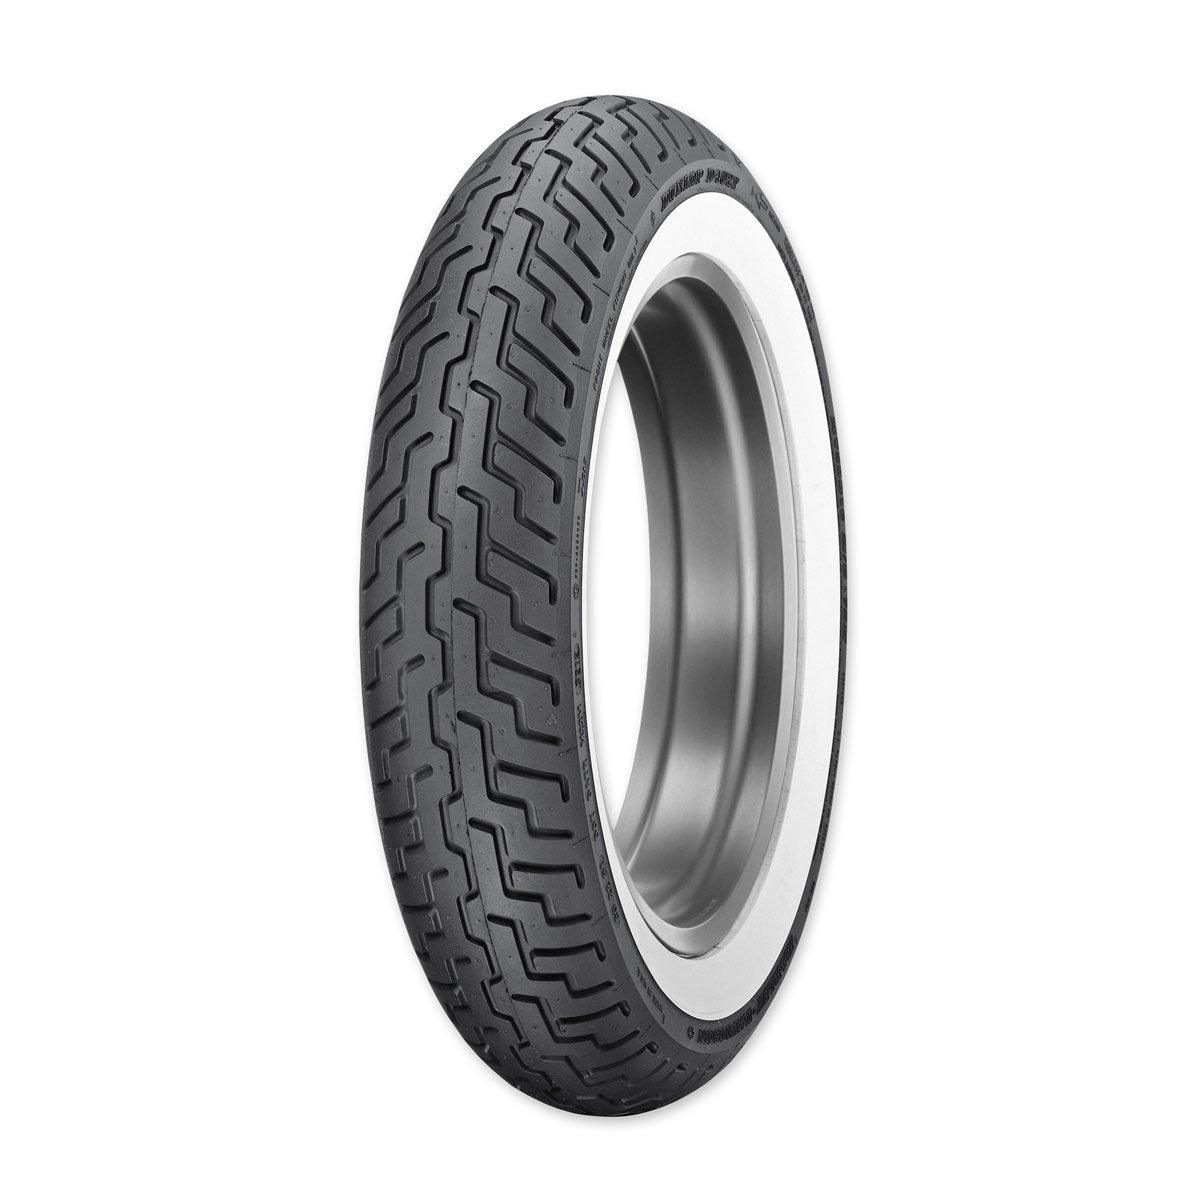 Dunlop D402 MT90B16 Wide Whitewall Front Tire 45006380 4333415935 31-4902-MPR2